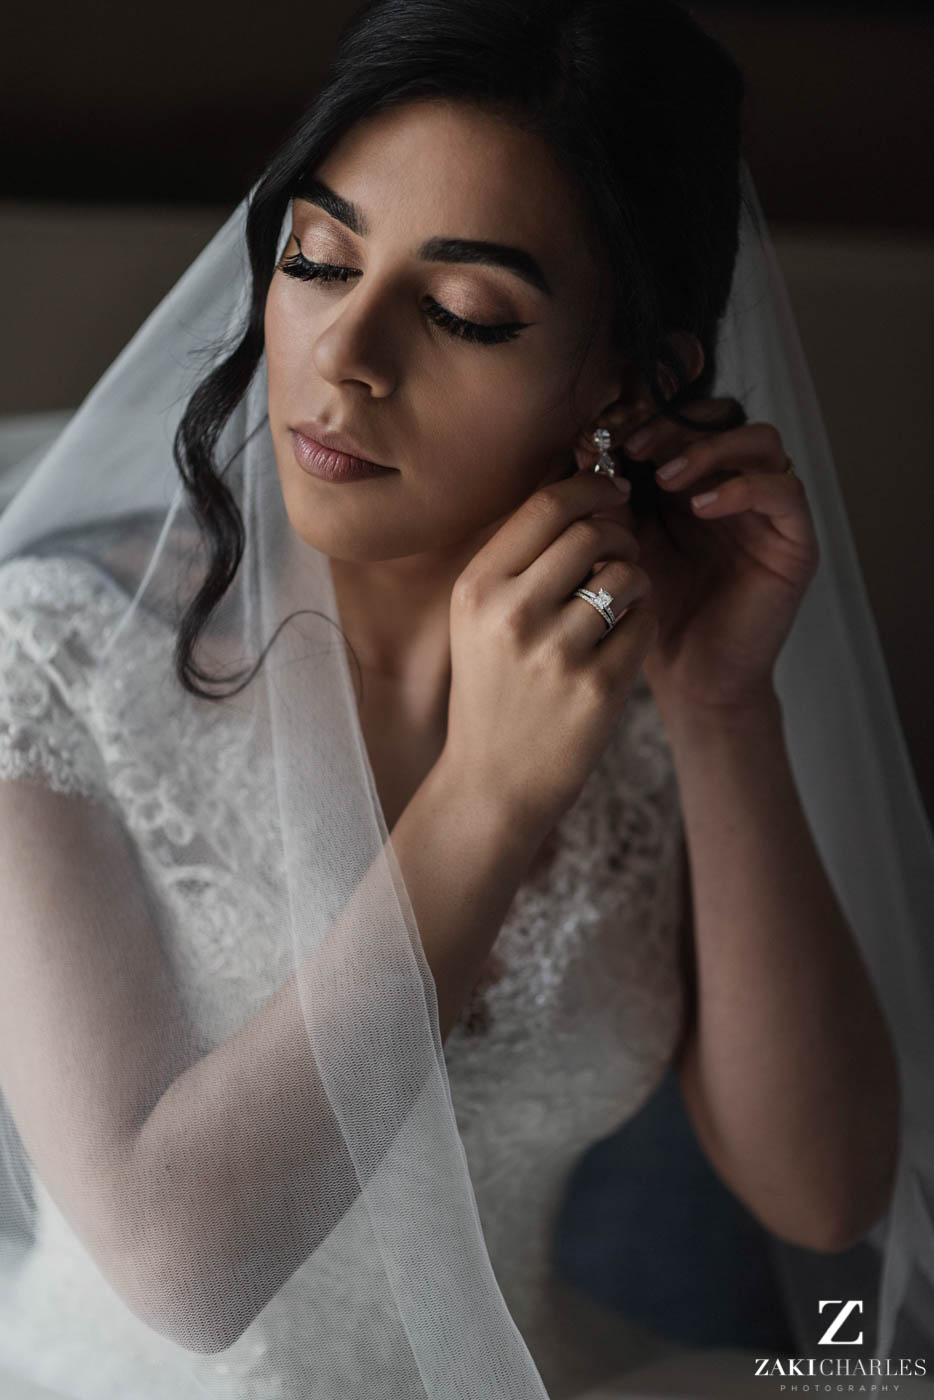 Natural light portrait of the bride at Marriott Hotel Regents Park 2